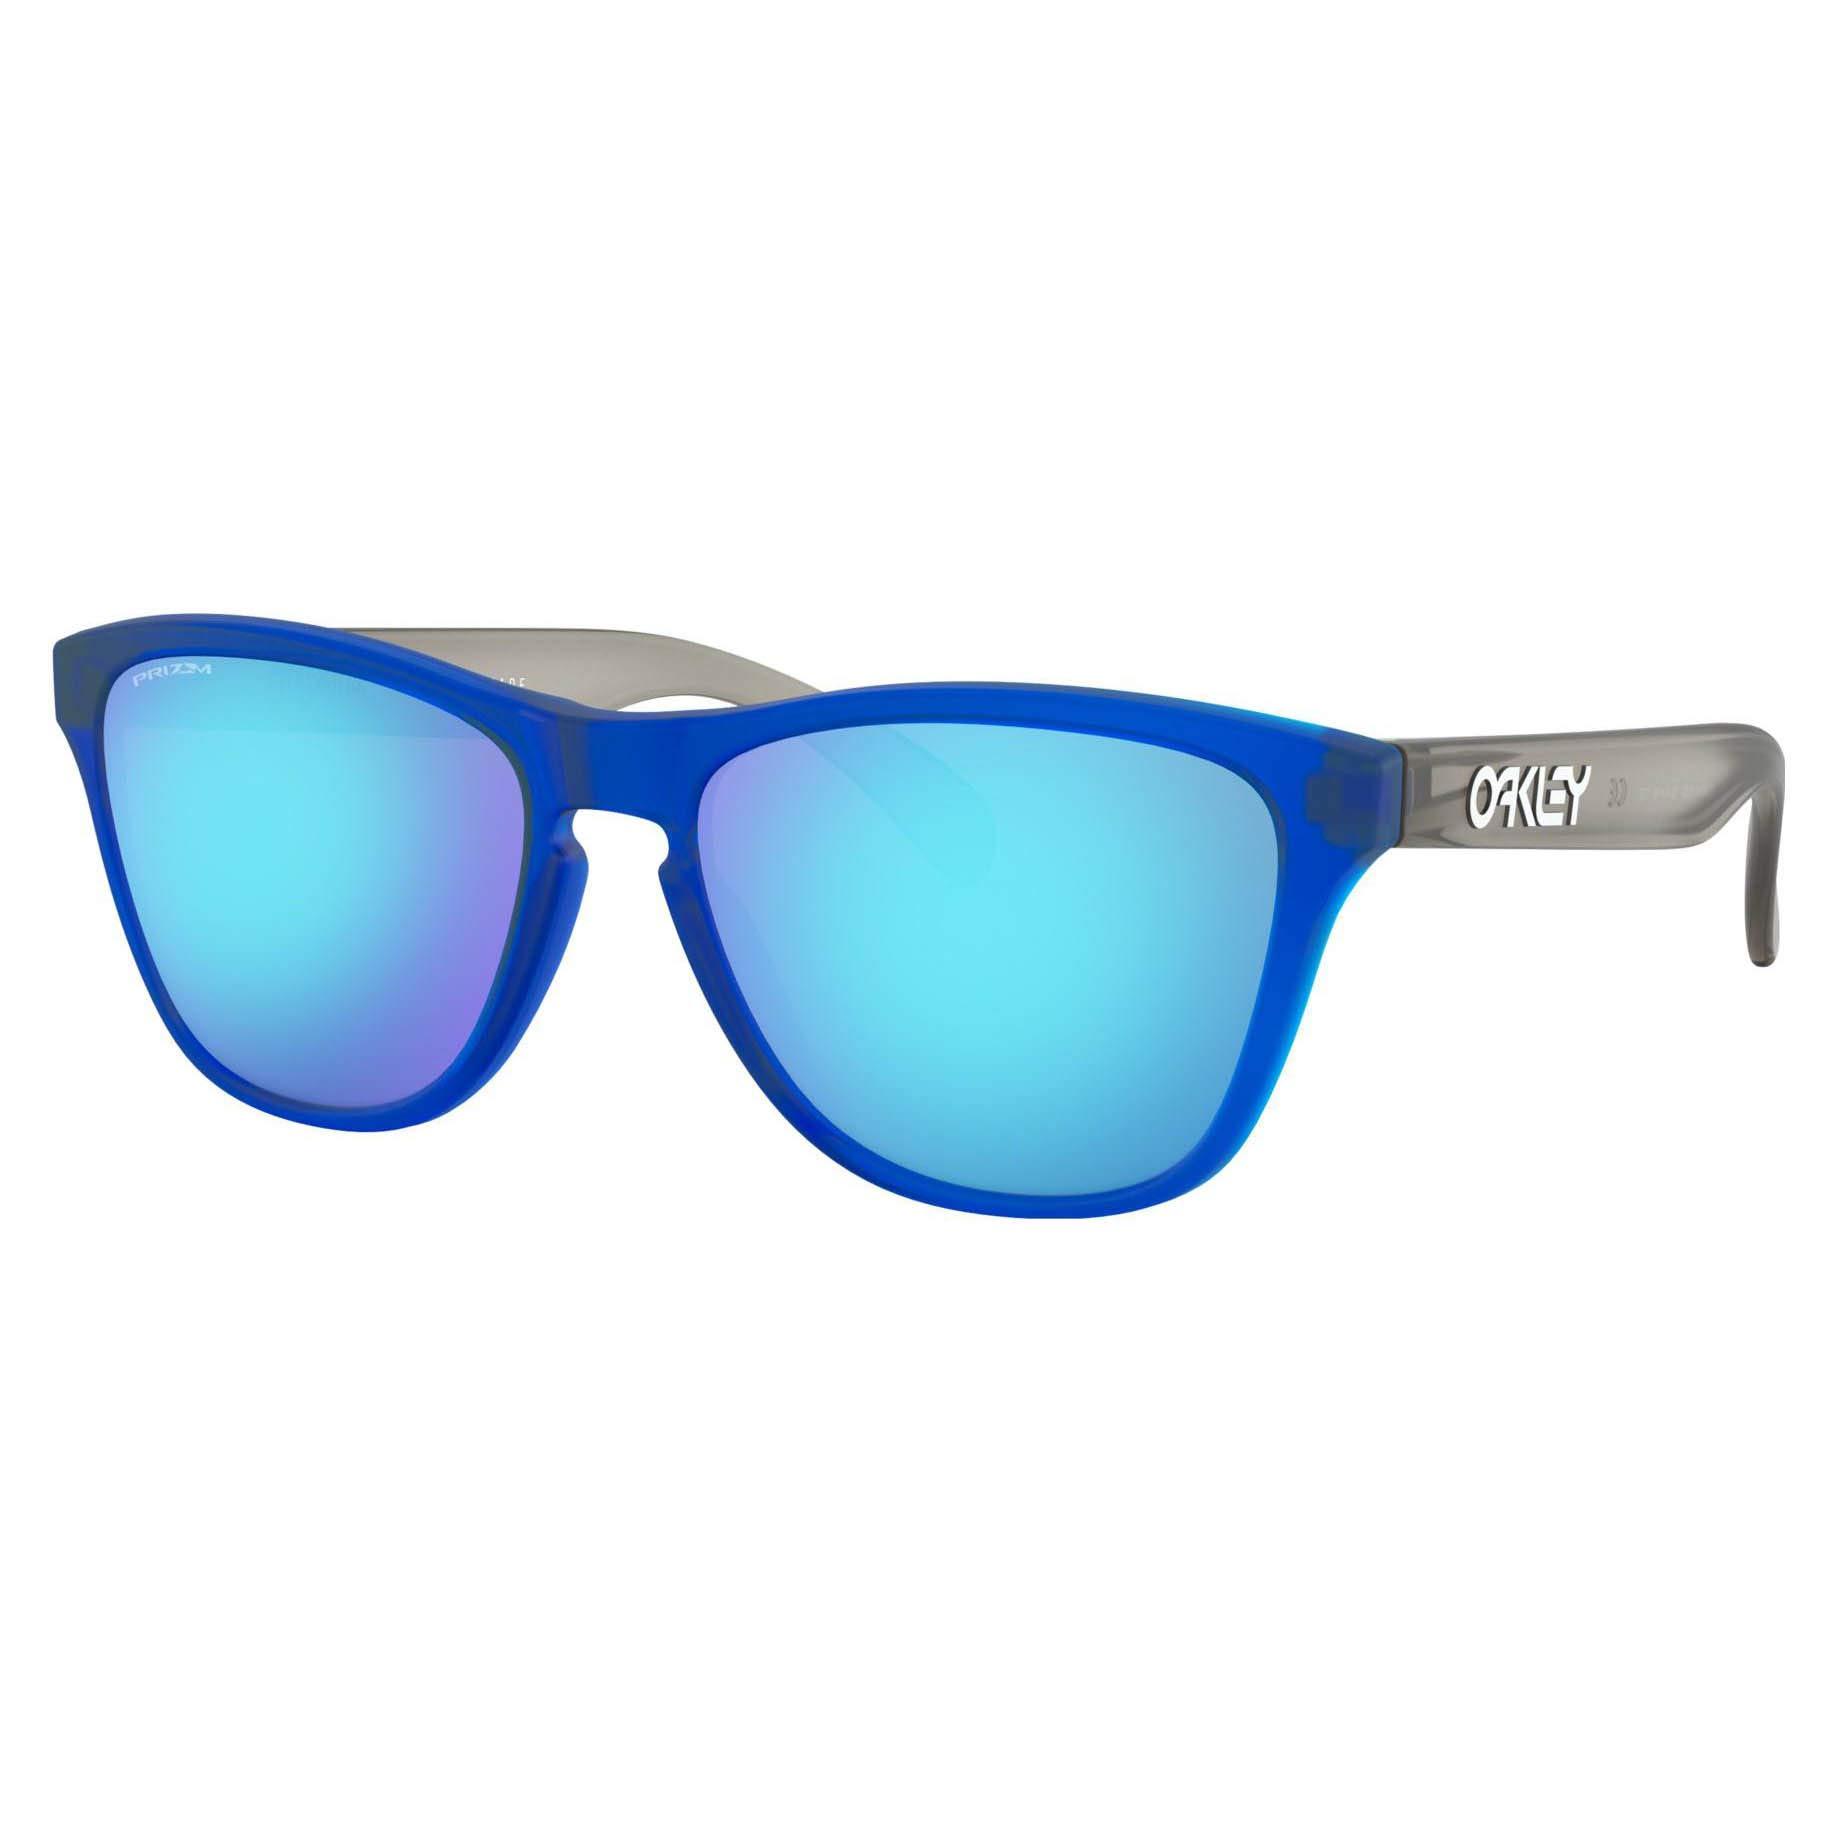 Oakley Youth Boys OJ9006 Frogskins XS Round Sunglasses, Matte Translucent Sapphire/Prizm Sapphire, 53 mm